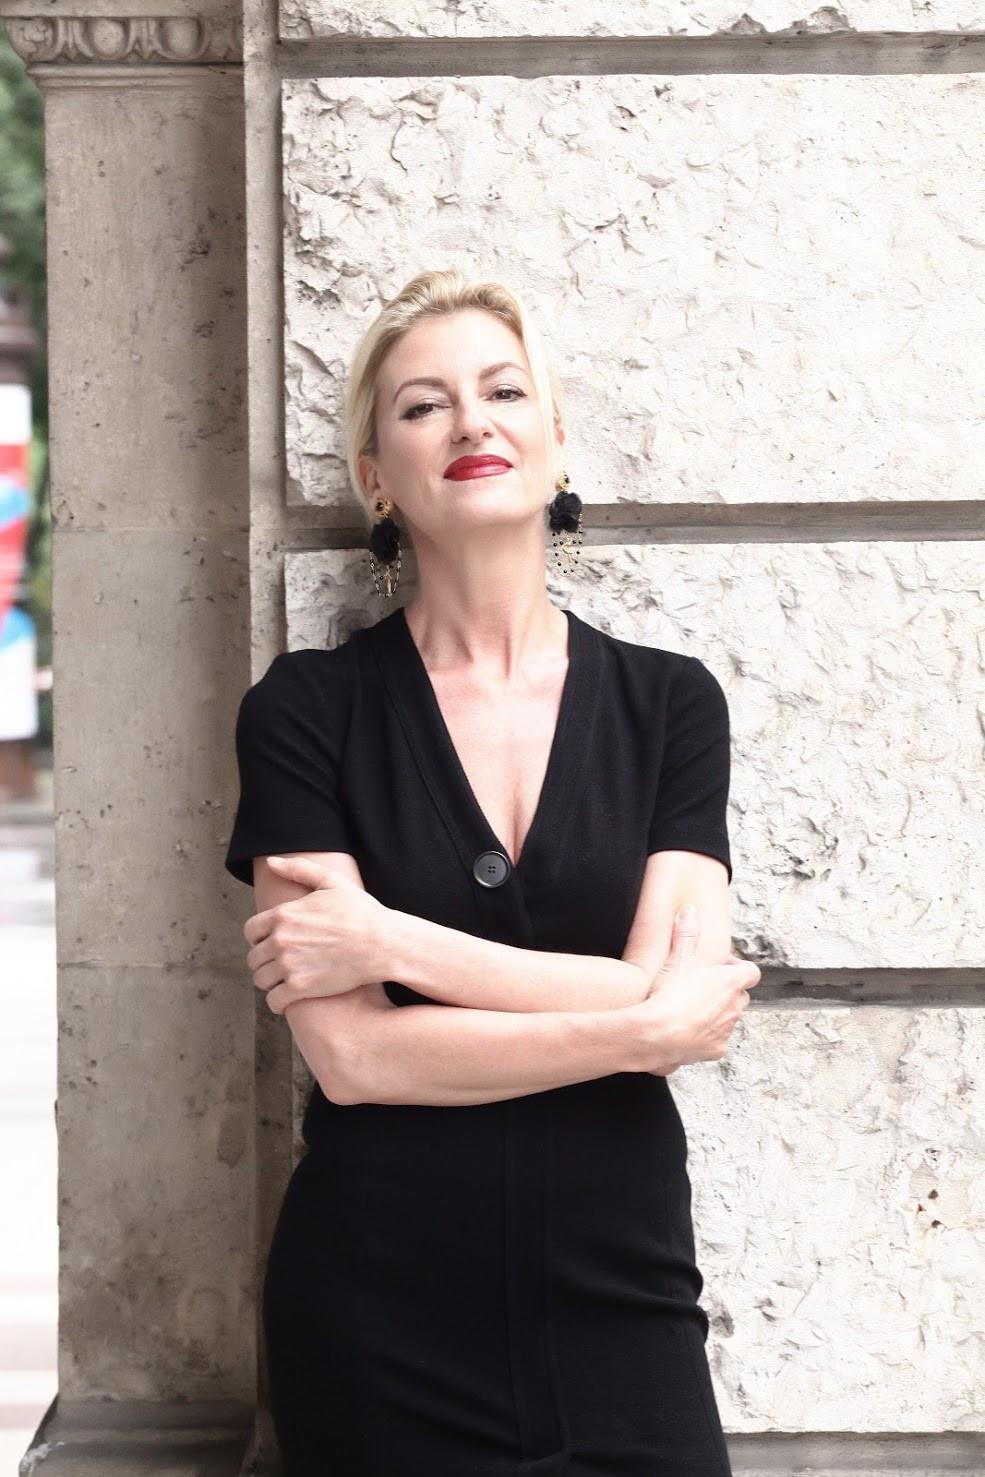 Katzenjammer - Lili Bach Blog